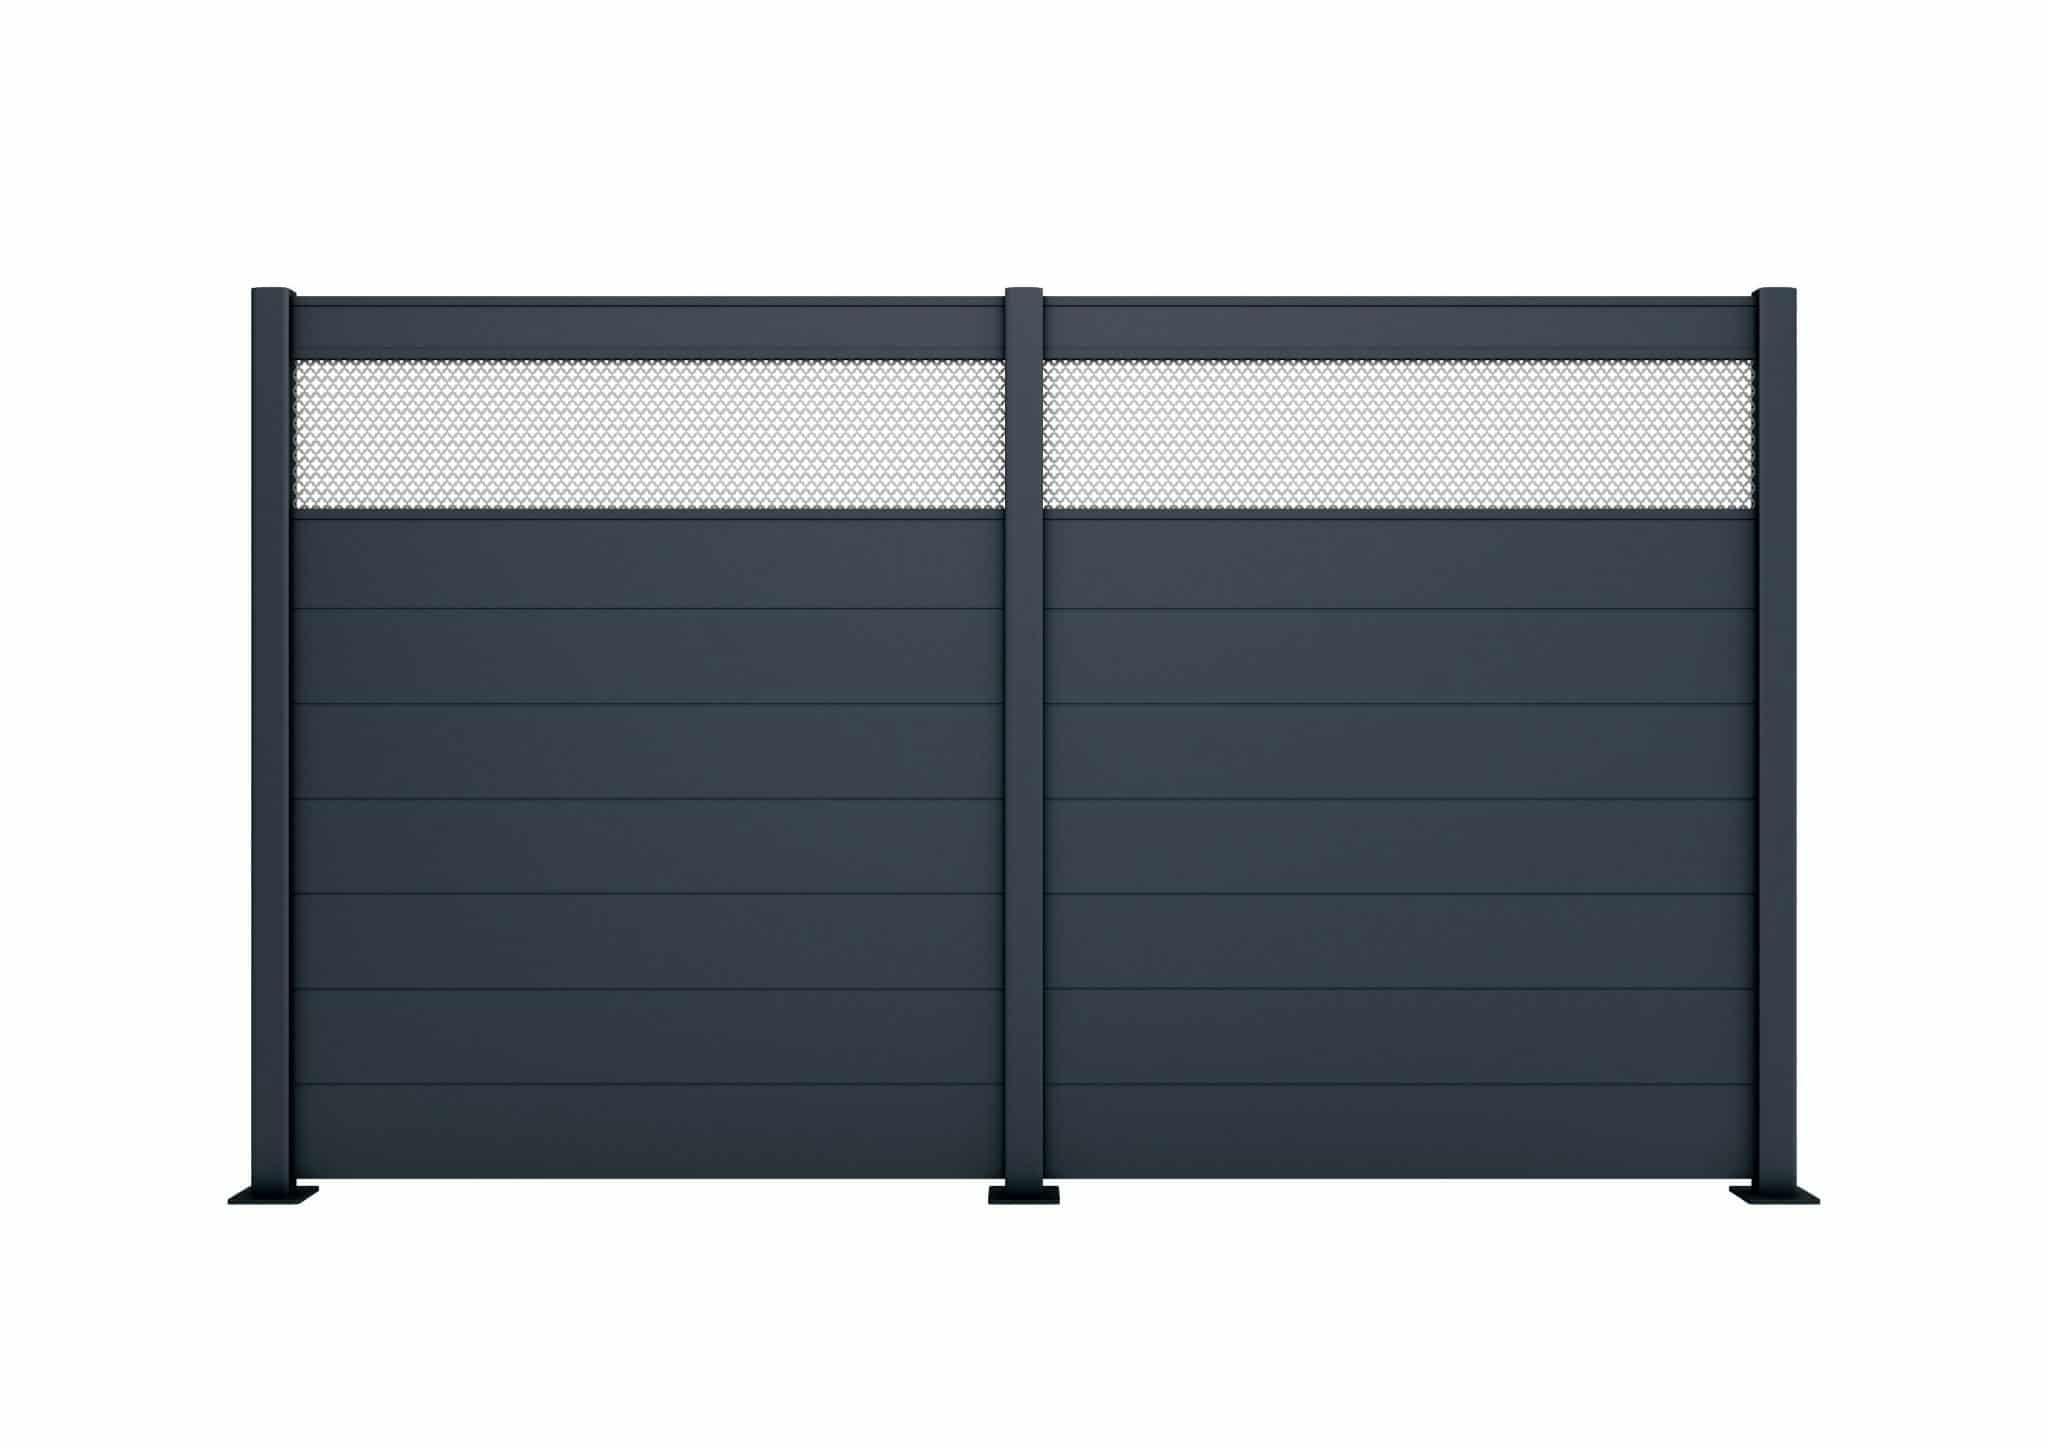 claustra aluminium plumbago les contemporains charuel. Black Bedroom Furniture Sets. Home Design Ideas